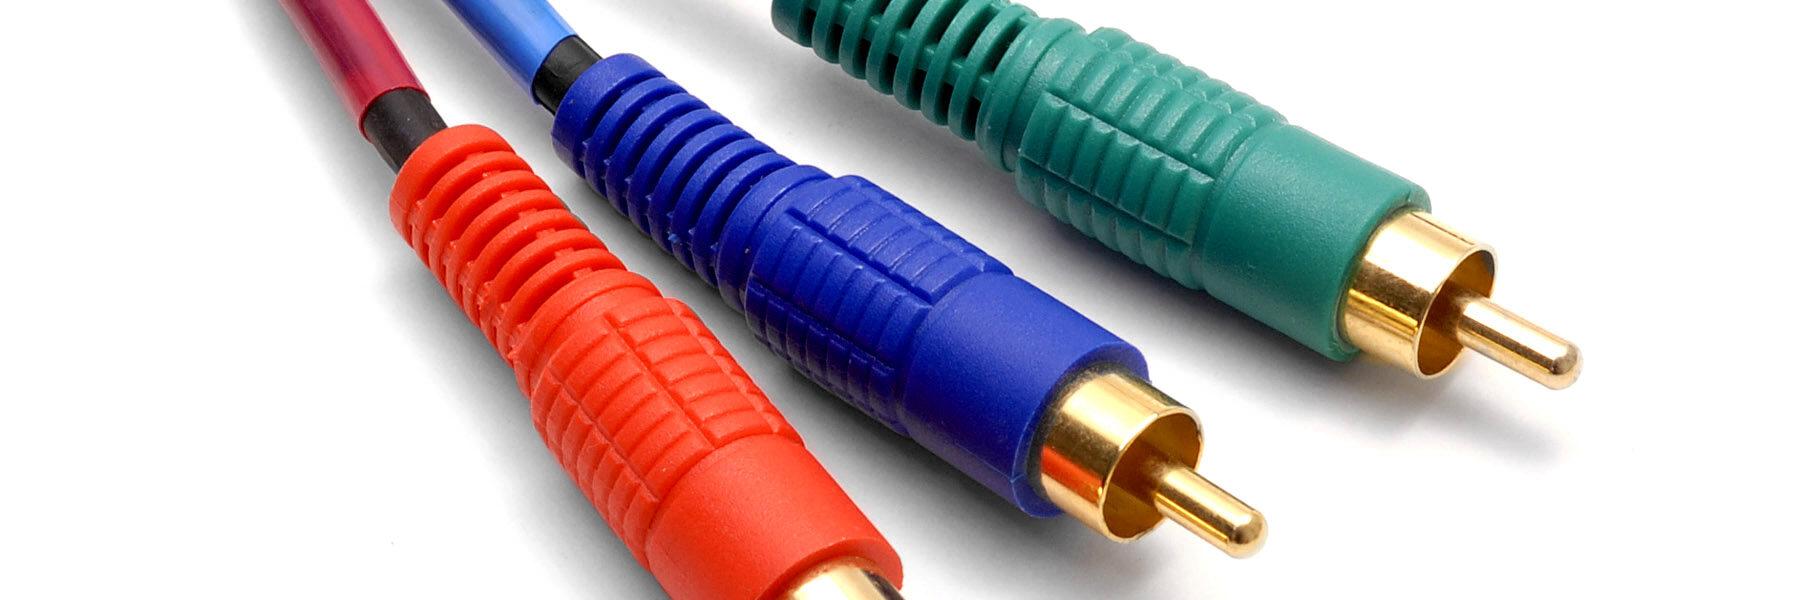 Component-cables